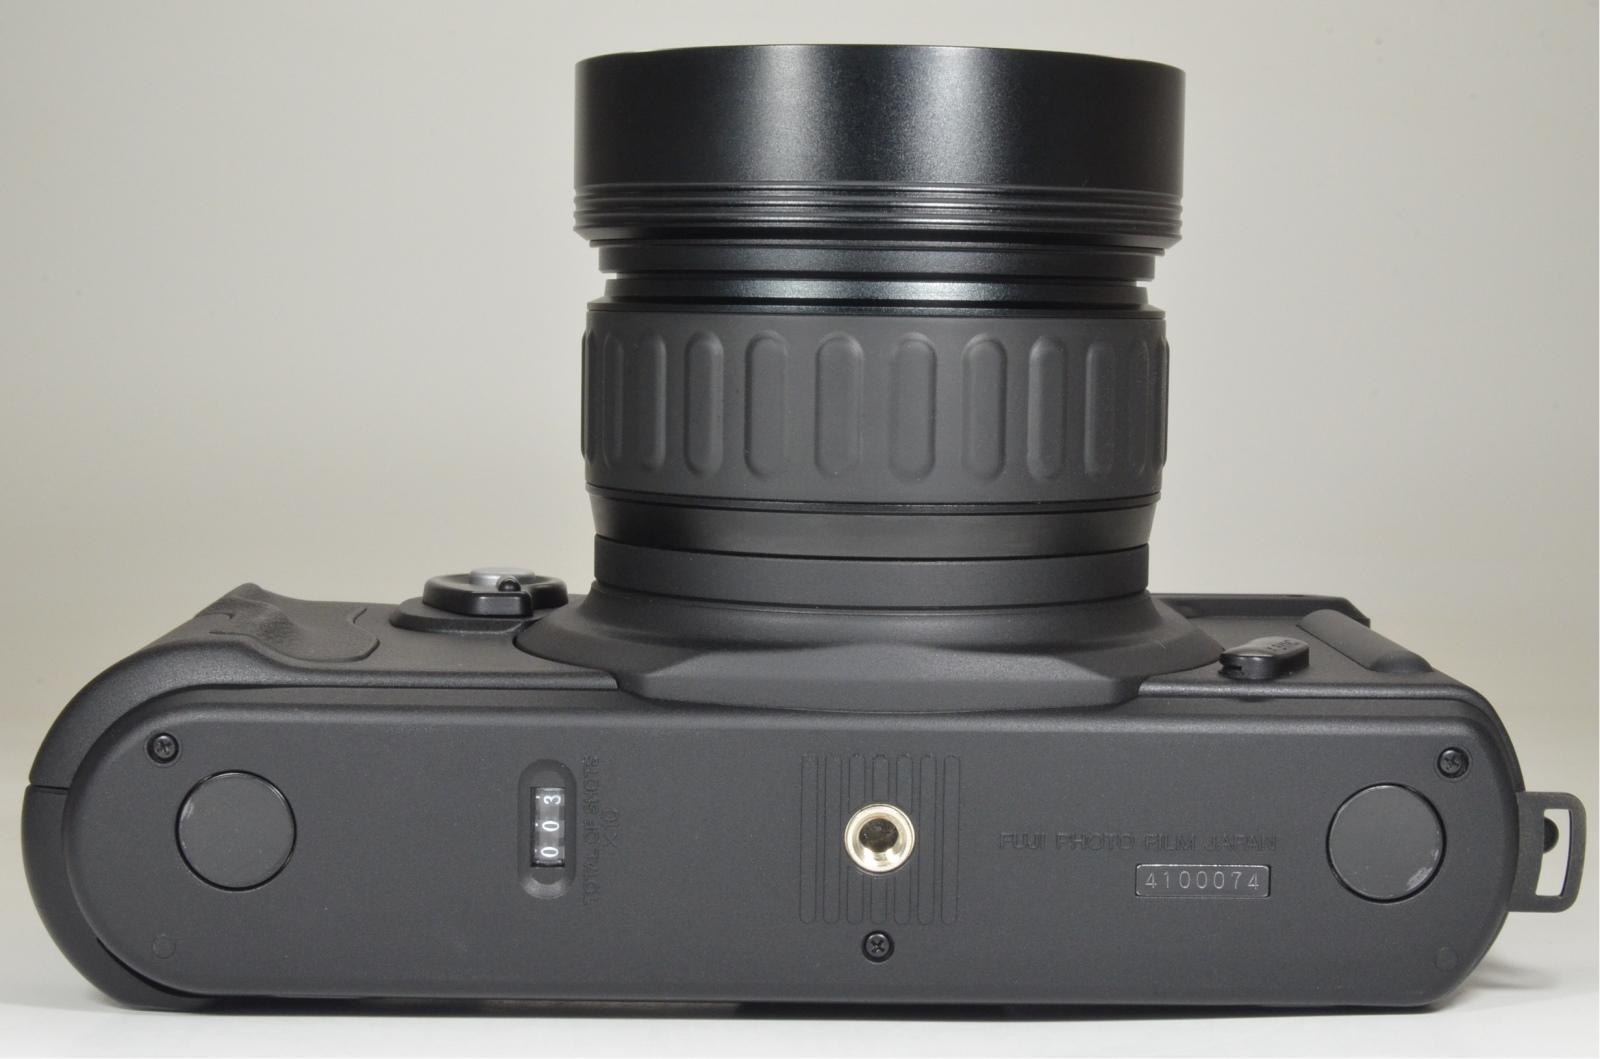 fuji fujifilm gw690iii 90mm f3.5 medium format count only '003' very rare!